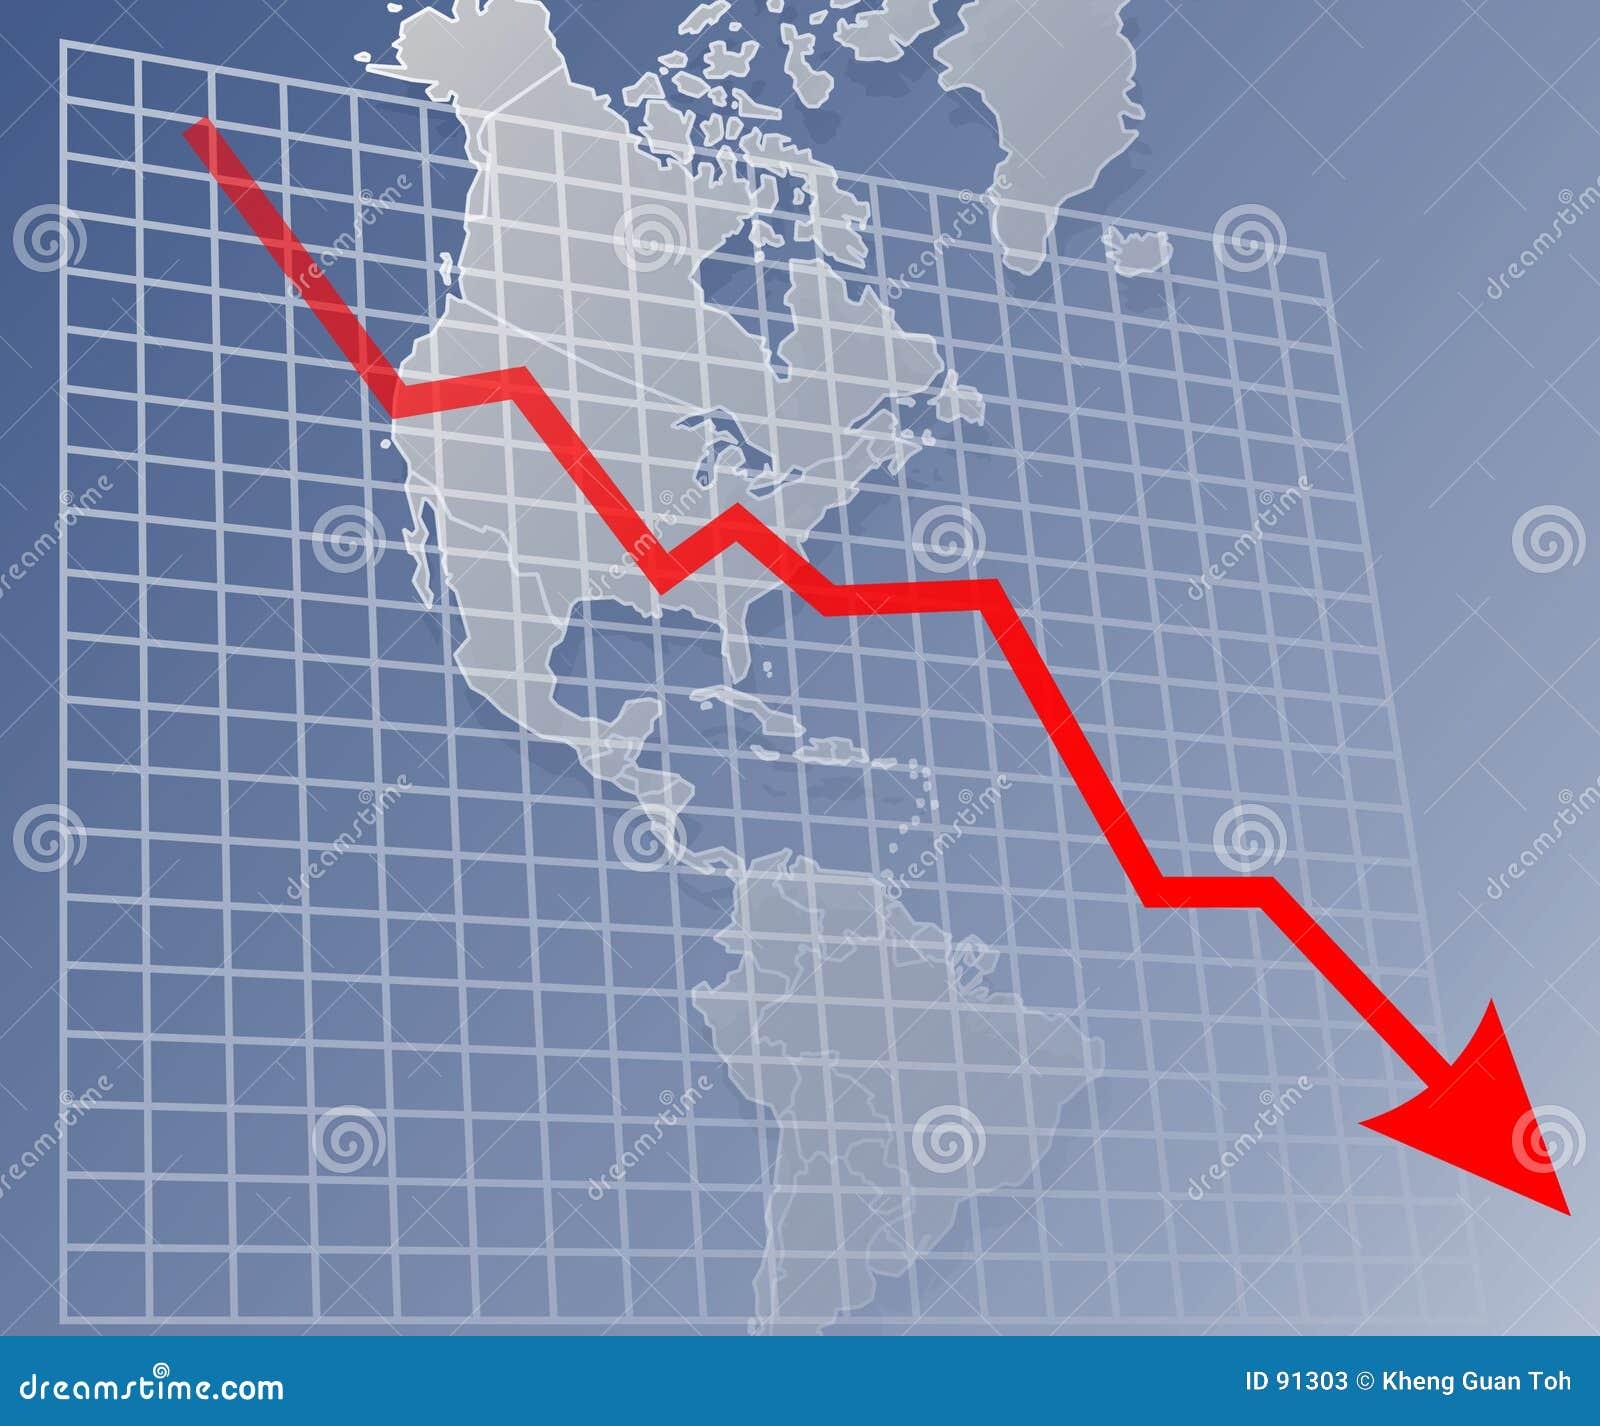 Americas chart ner